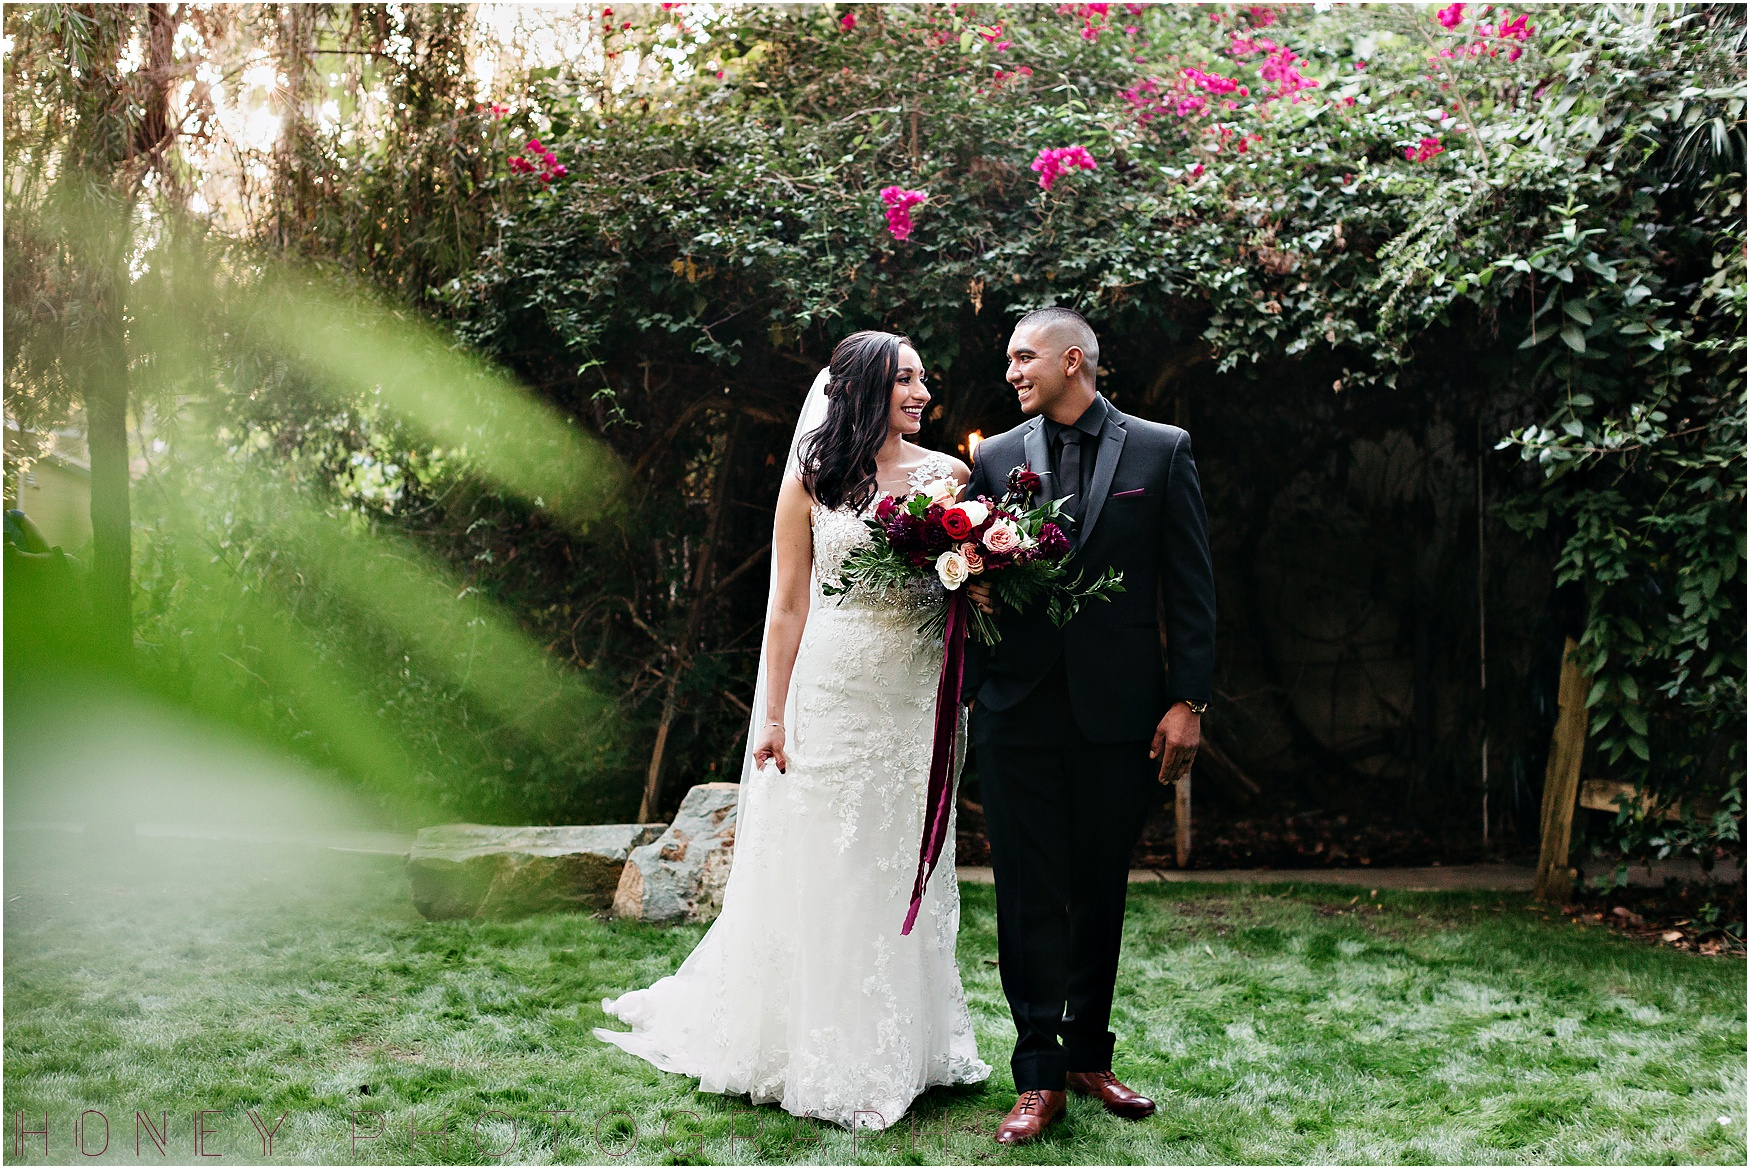 twin_oaks_garden_estate_fall_winter_burgundy_wedding032.jpg